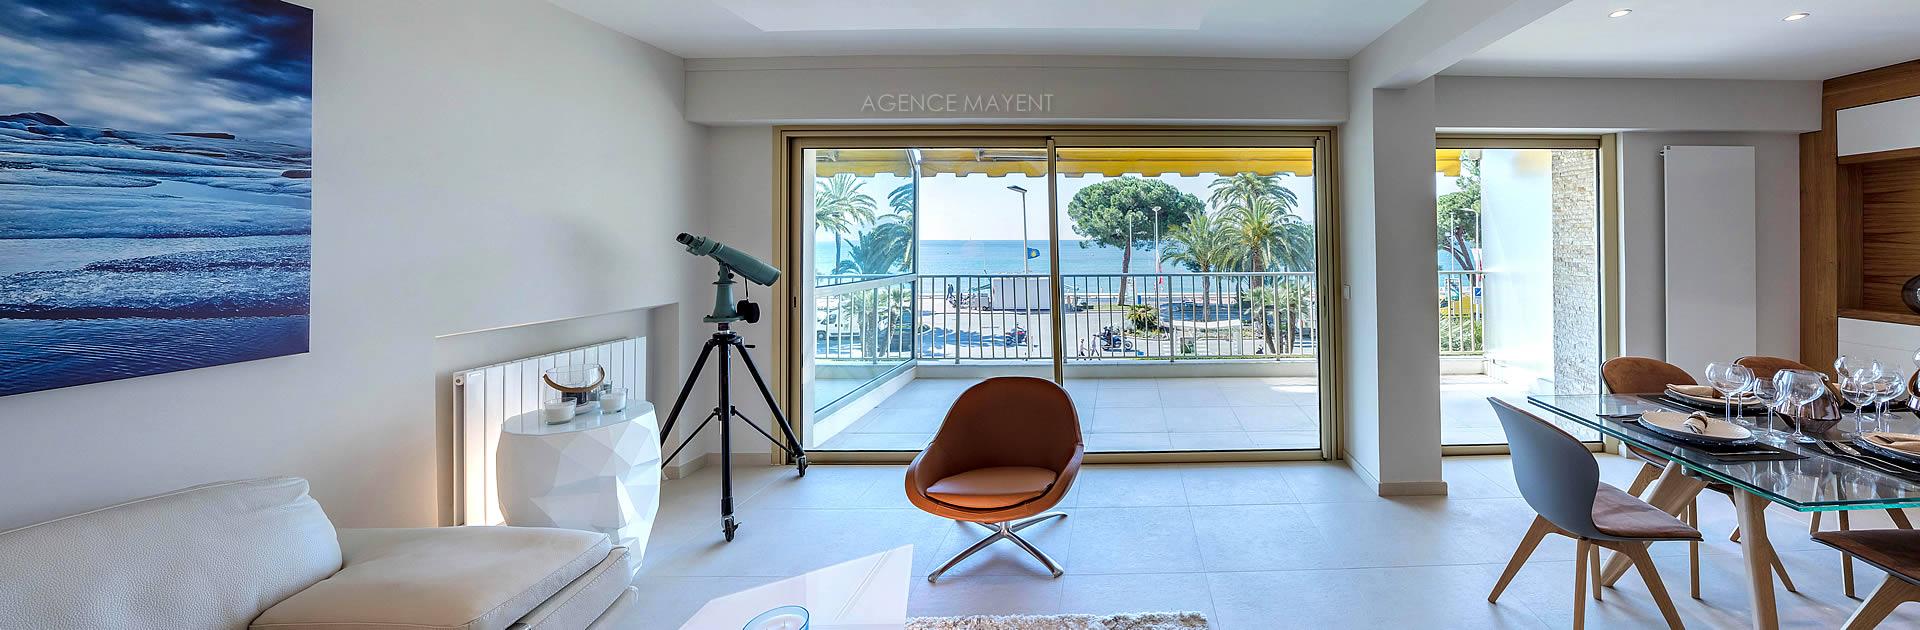 Vente appartement vue mer Cannes